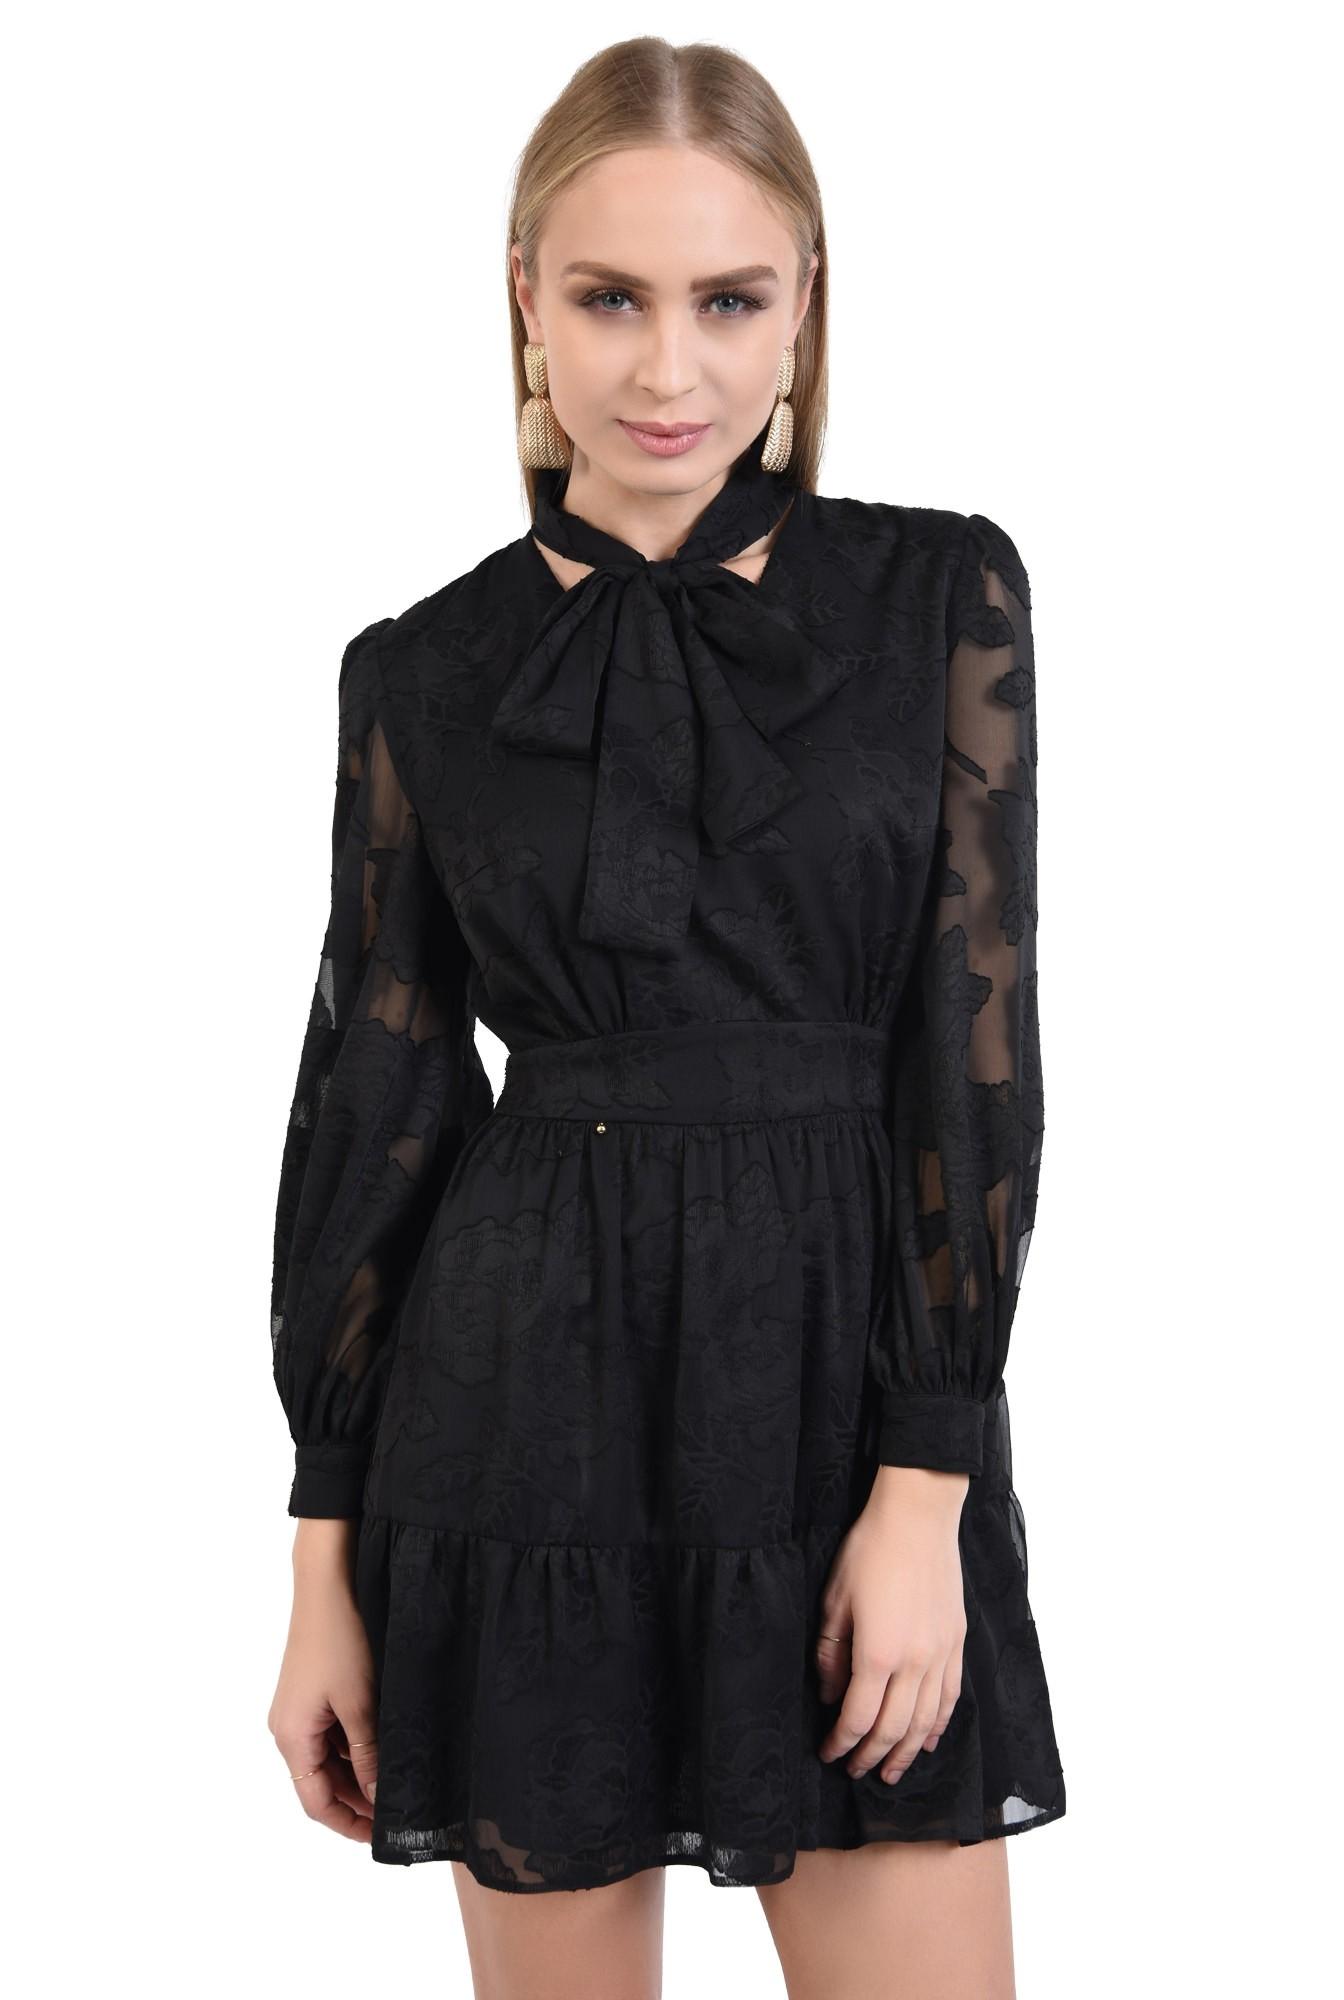 2 - rochie neagra, little black dress, croi evazat cu volan